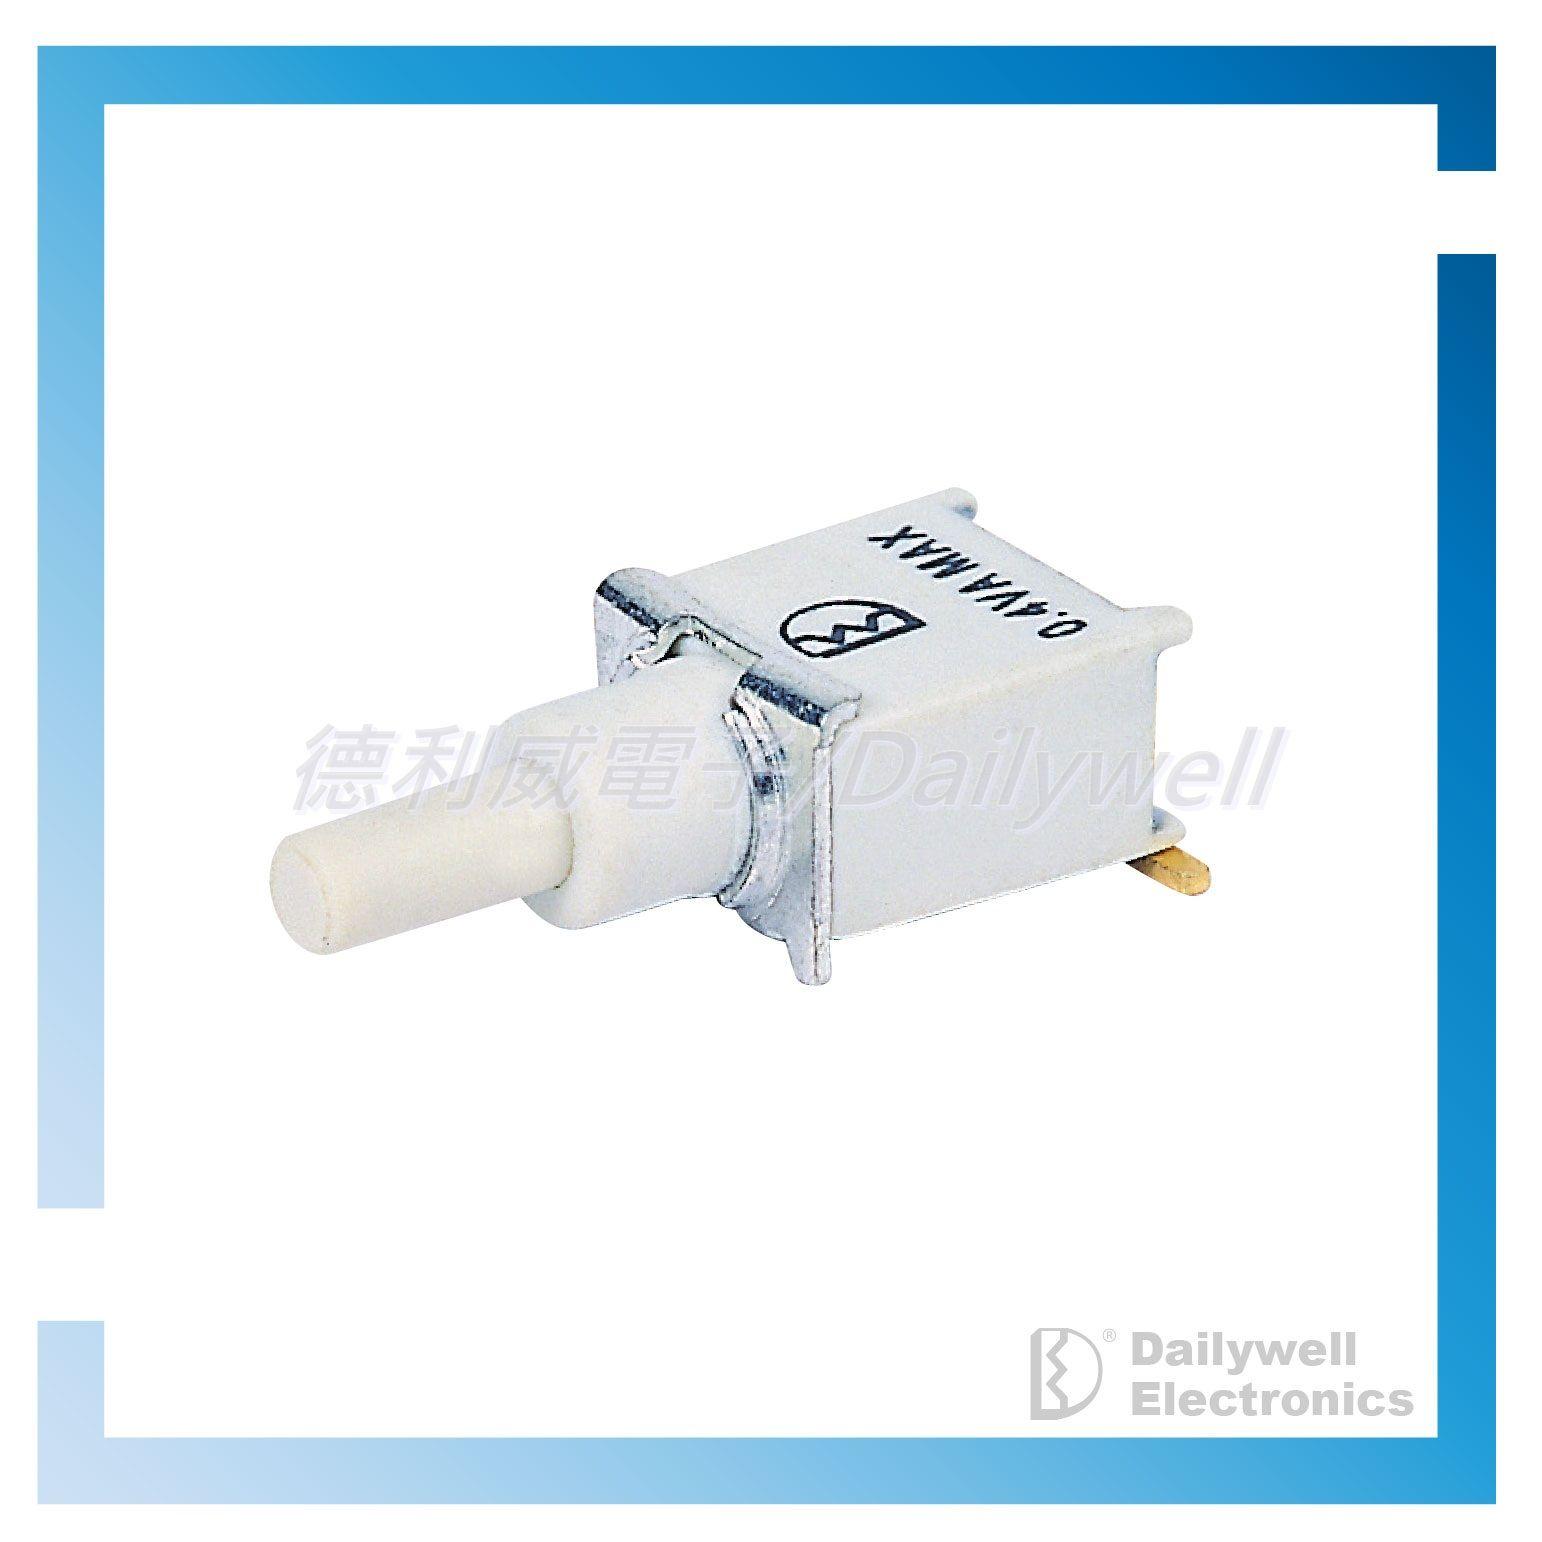 Sealed Sub-Miniature Pushbutton Switches